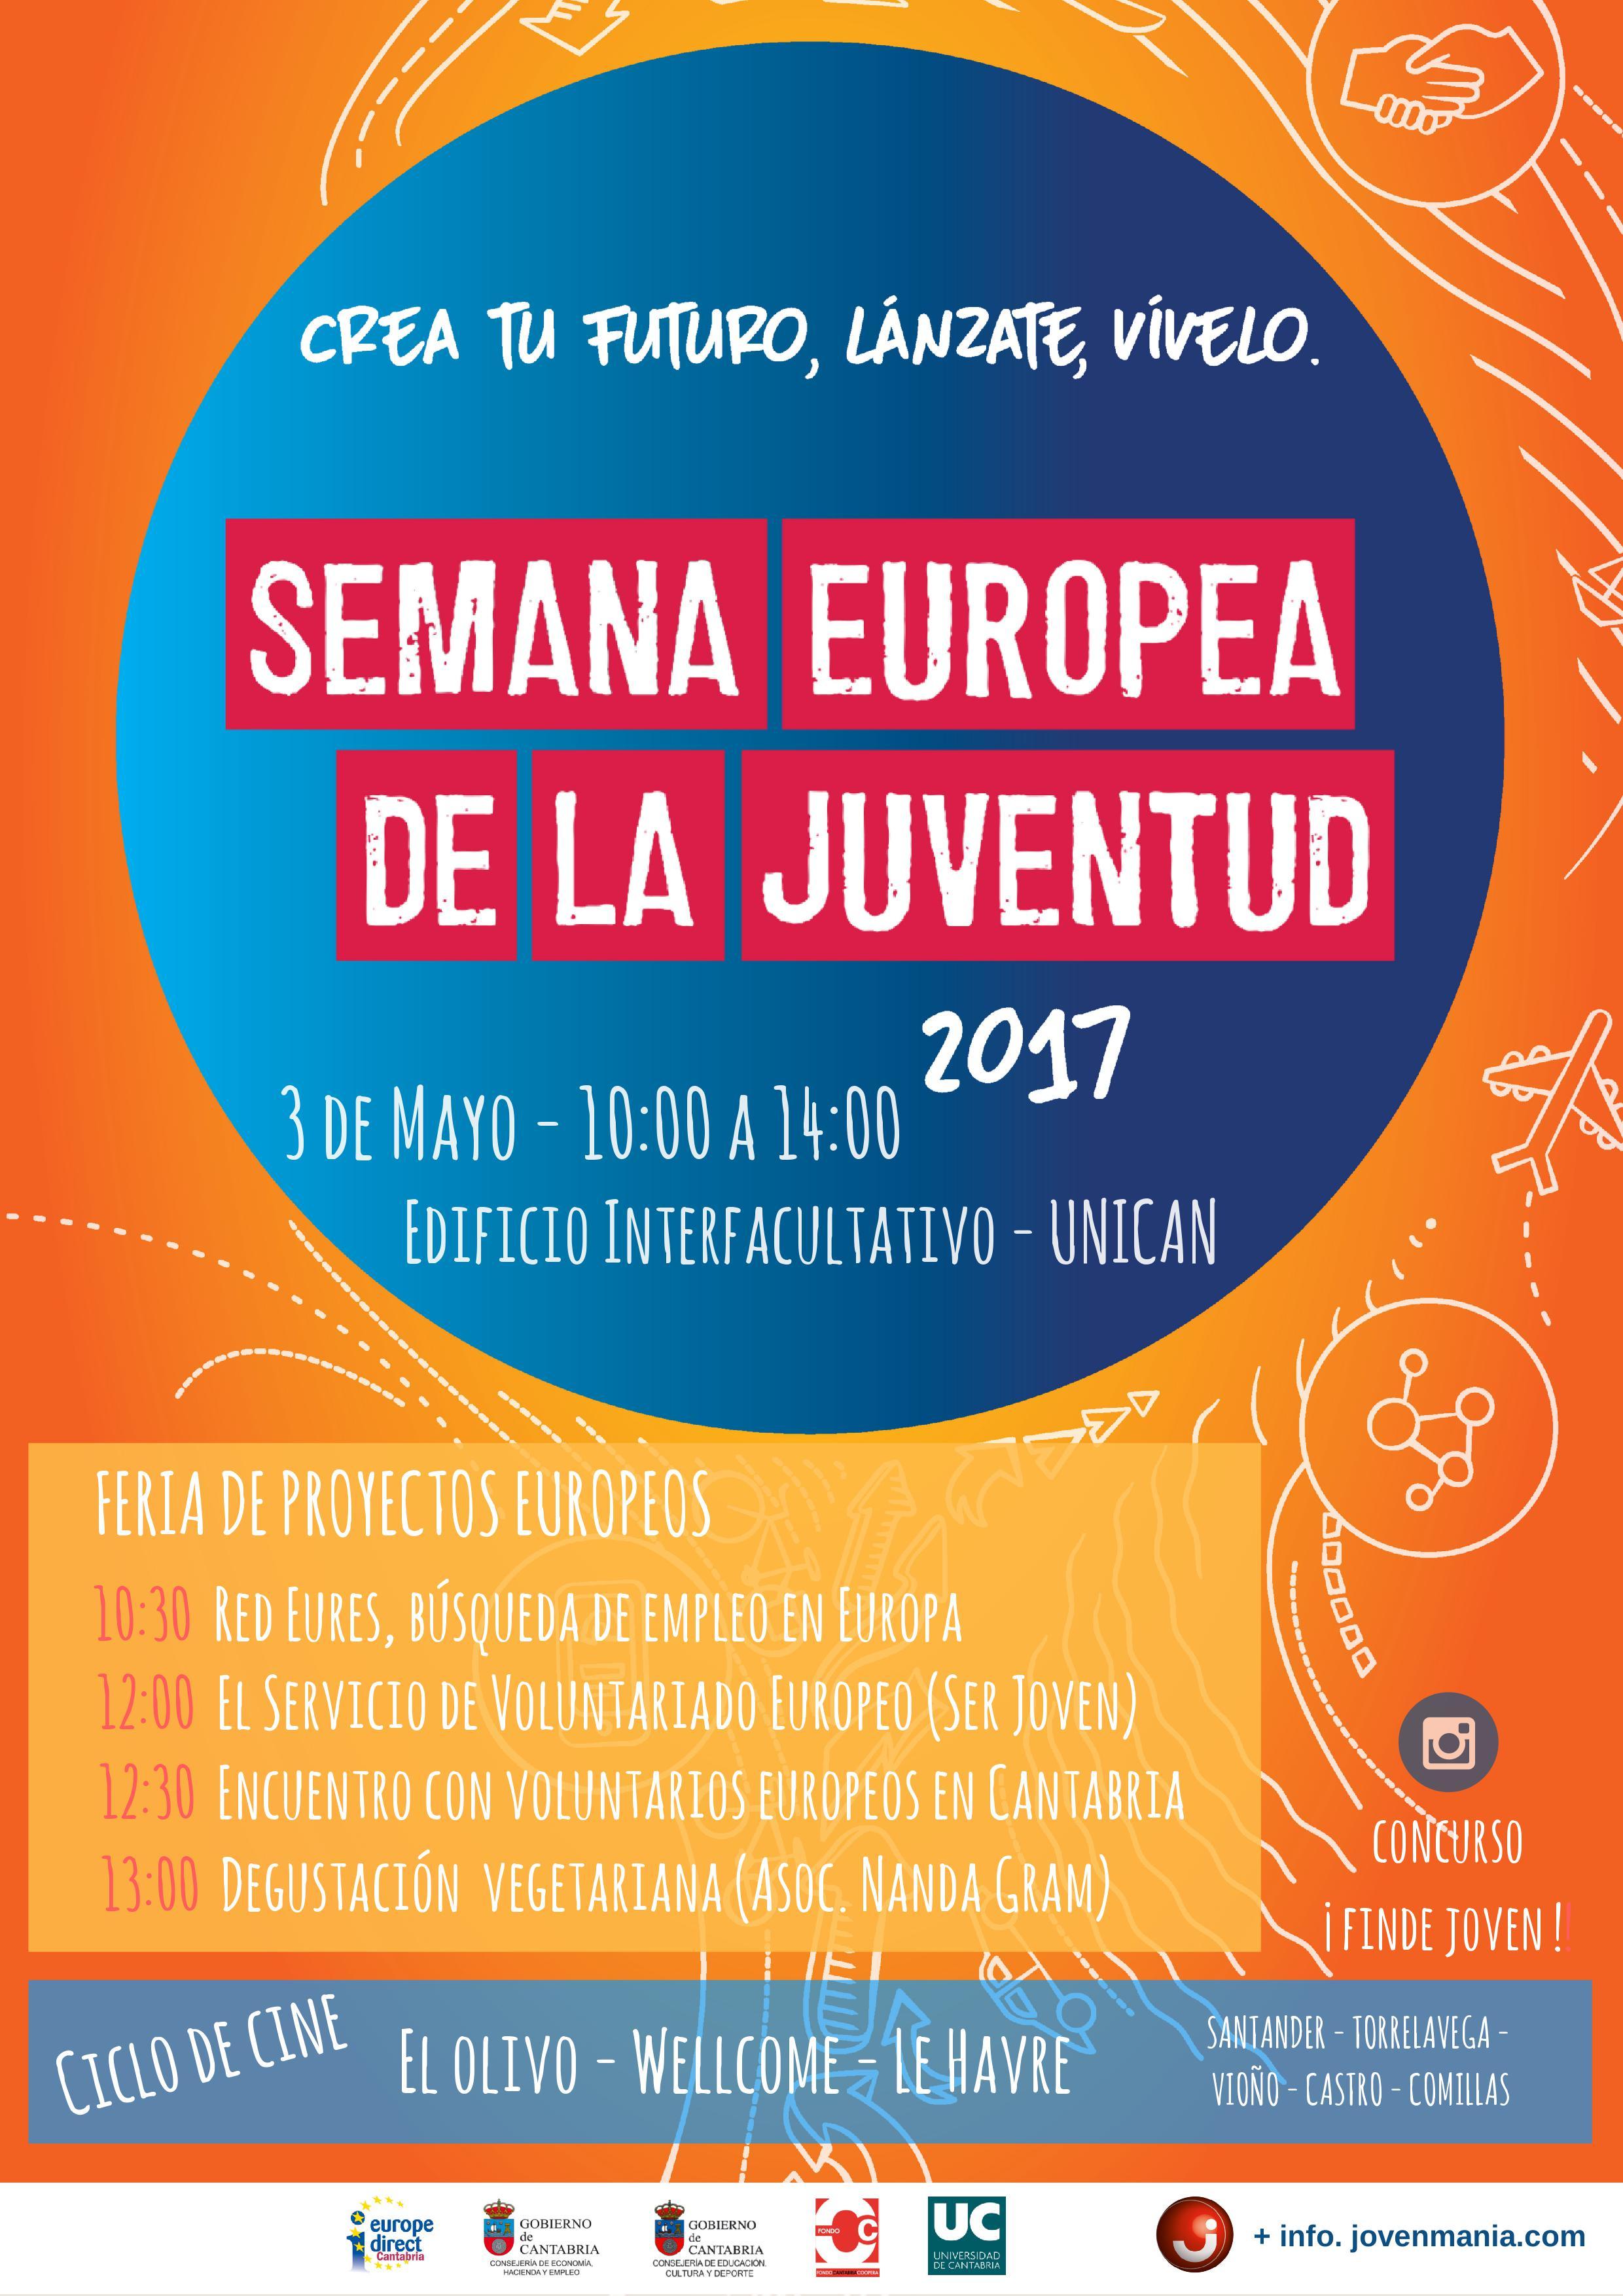 Semana Europea de la Juventud - Agenda de Actividades - EUROPA Cantabria